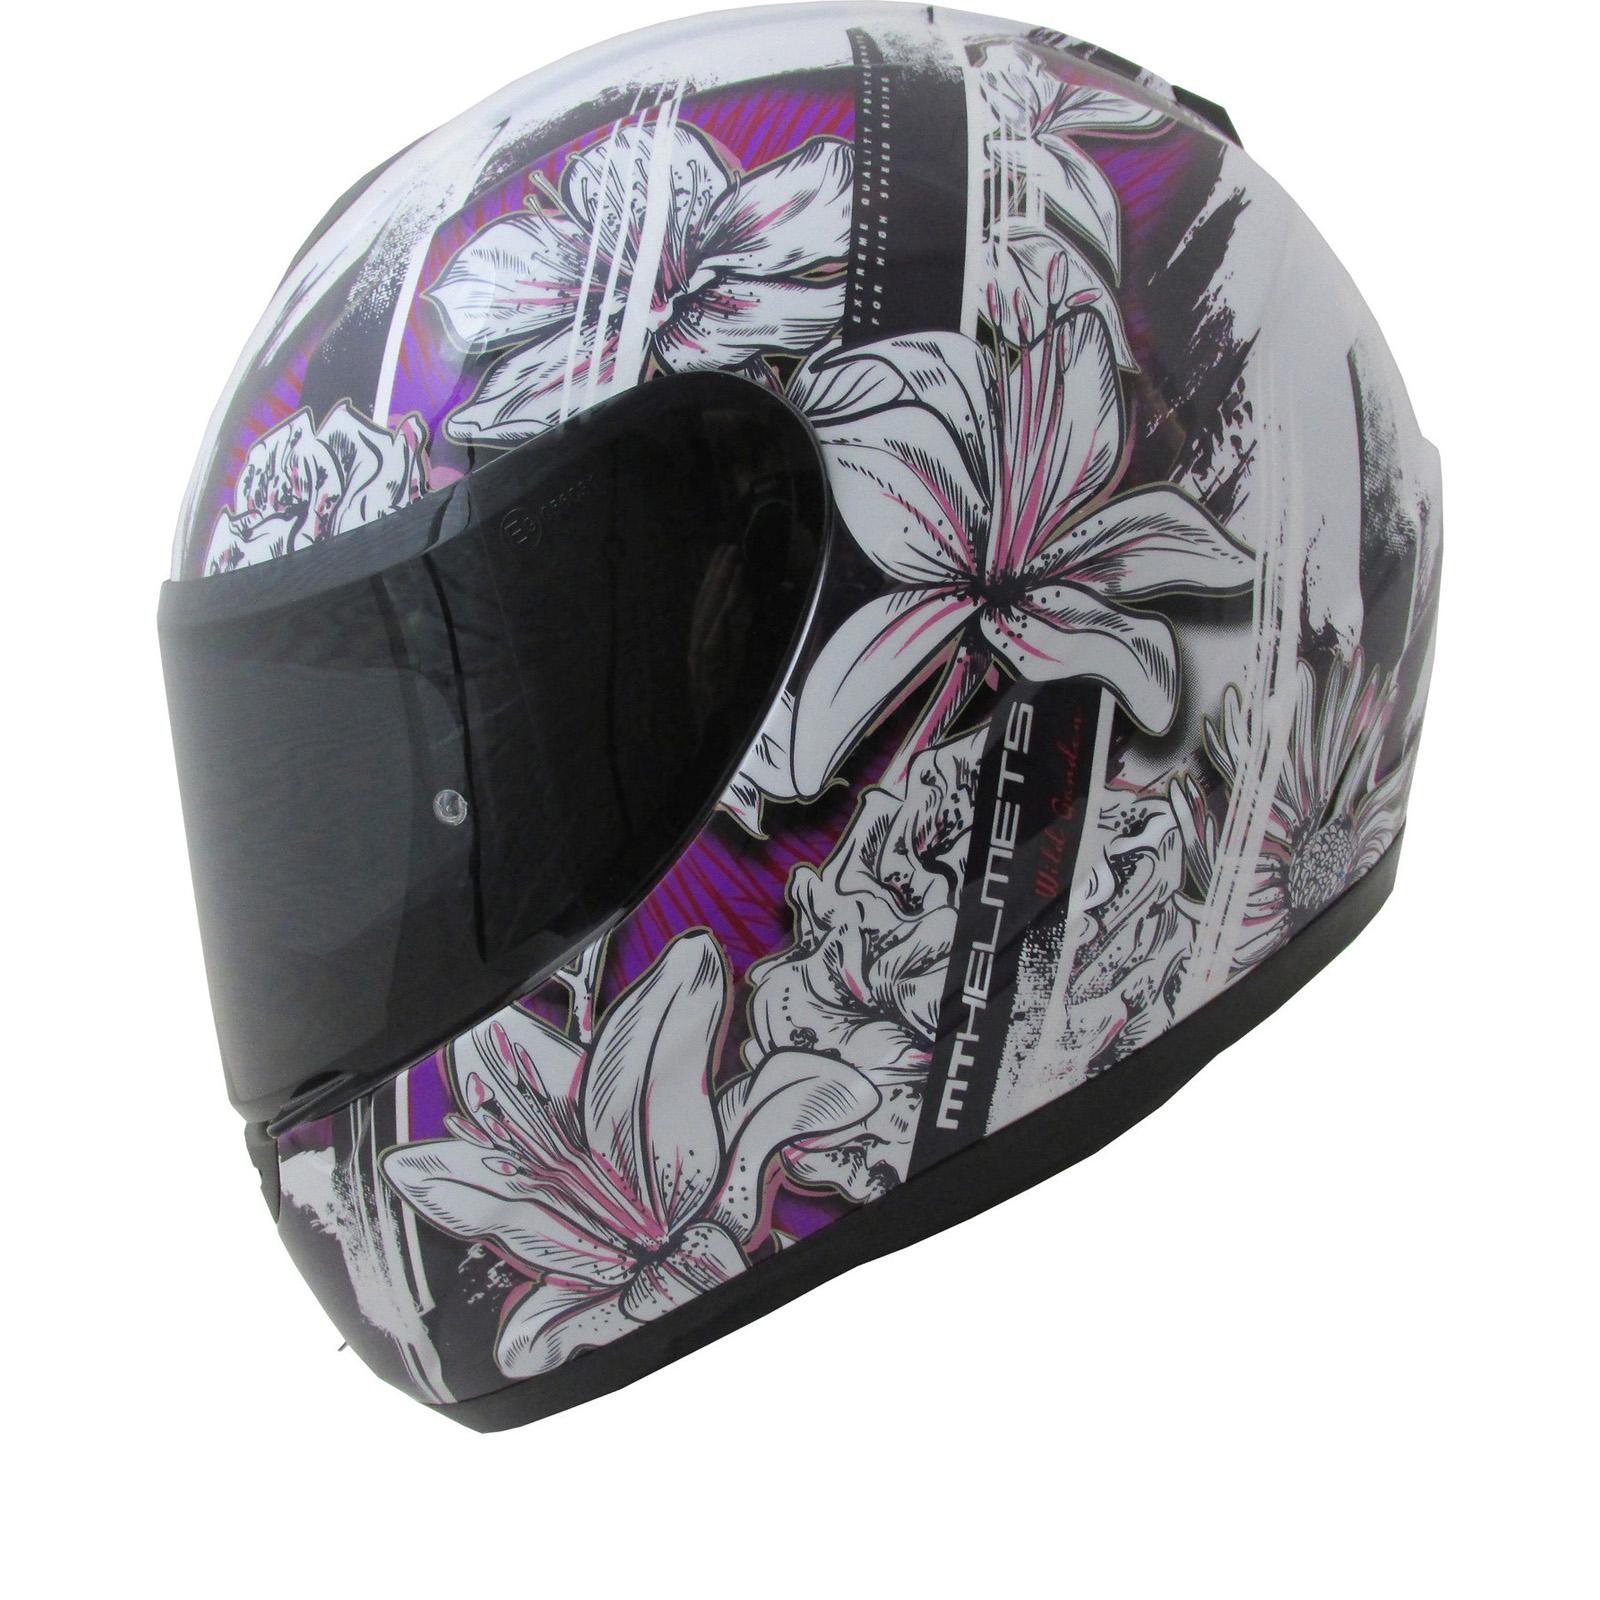 Wild motorcycle helmets